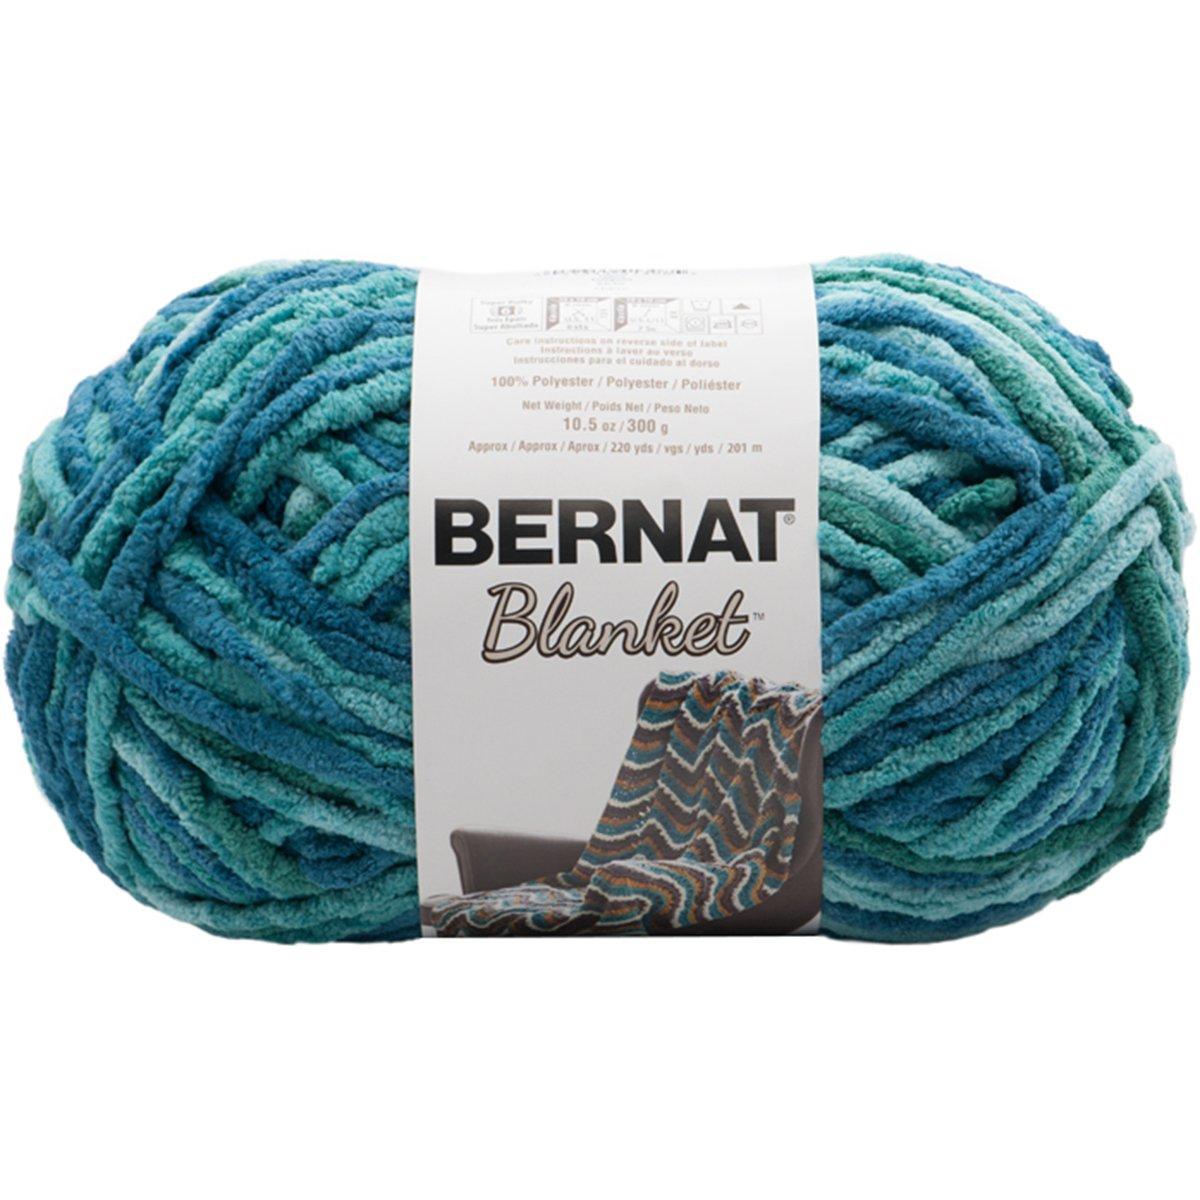 Bernat 16111010809 Machine Washable Ball of Yarn Tidepool Spinrite